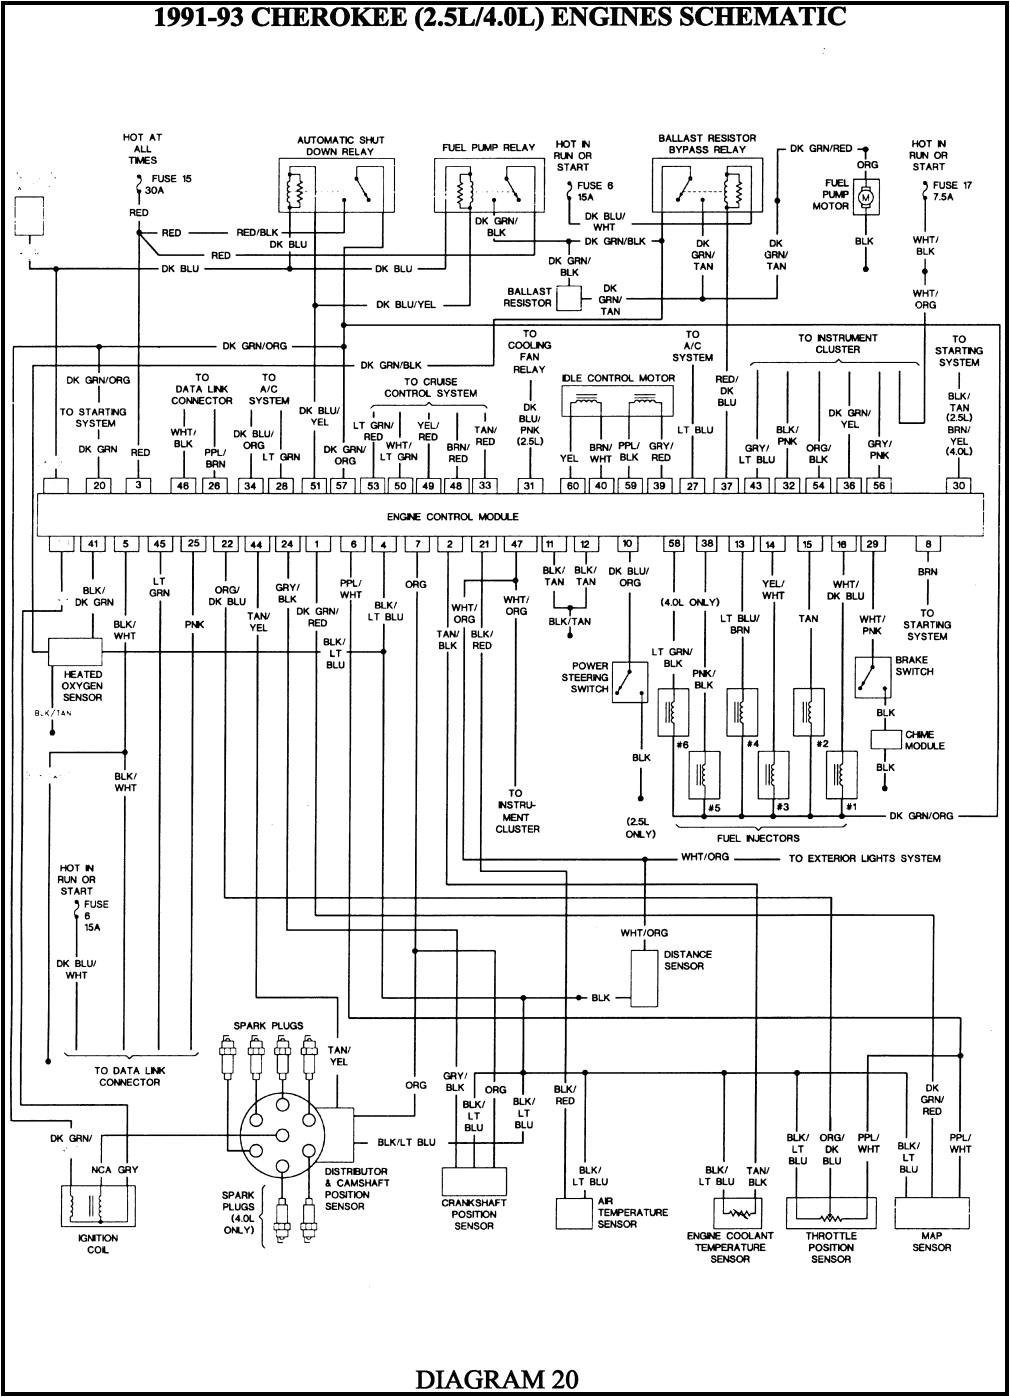 1998 jeep wrangler wiring diagramrcrenos.com